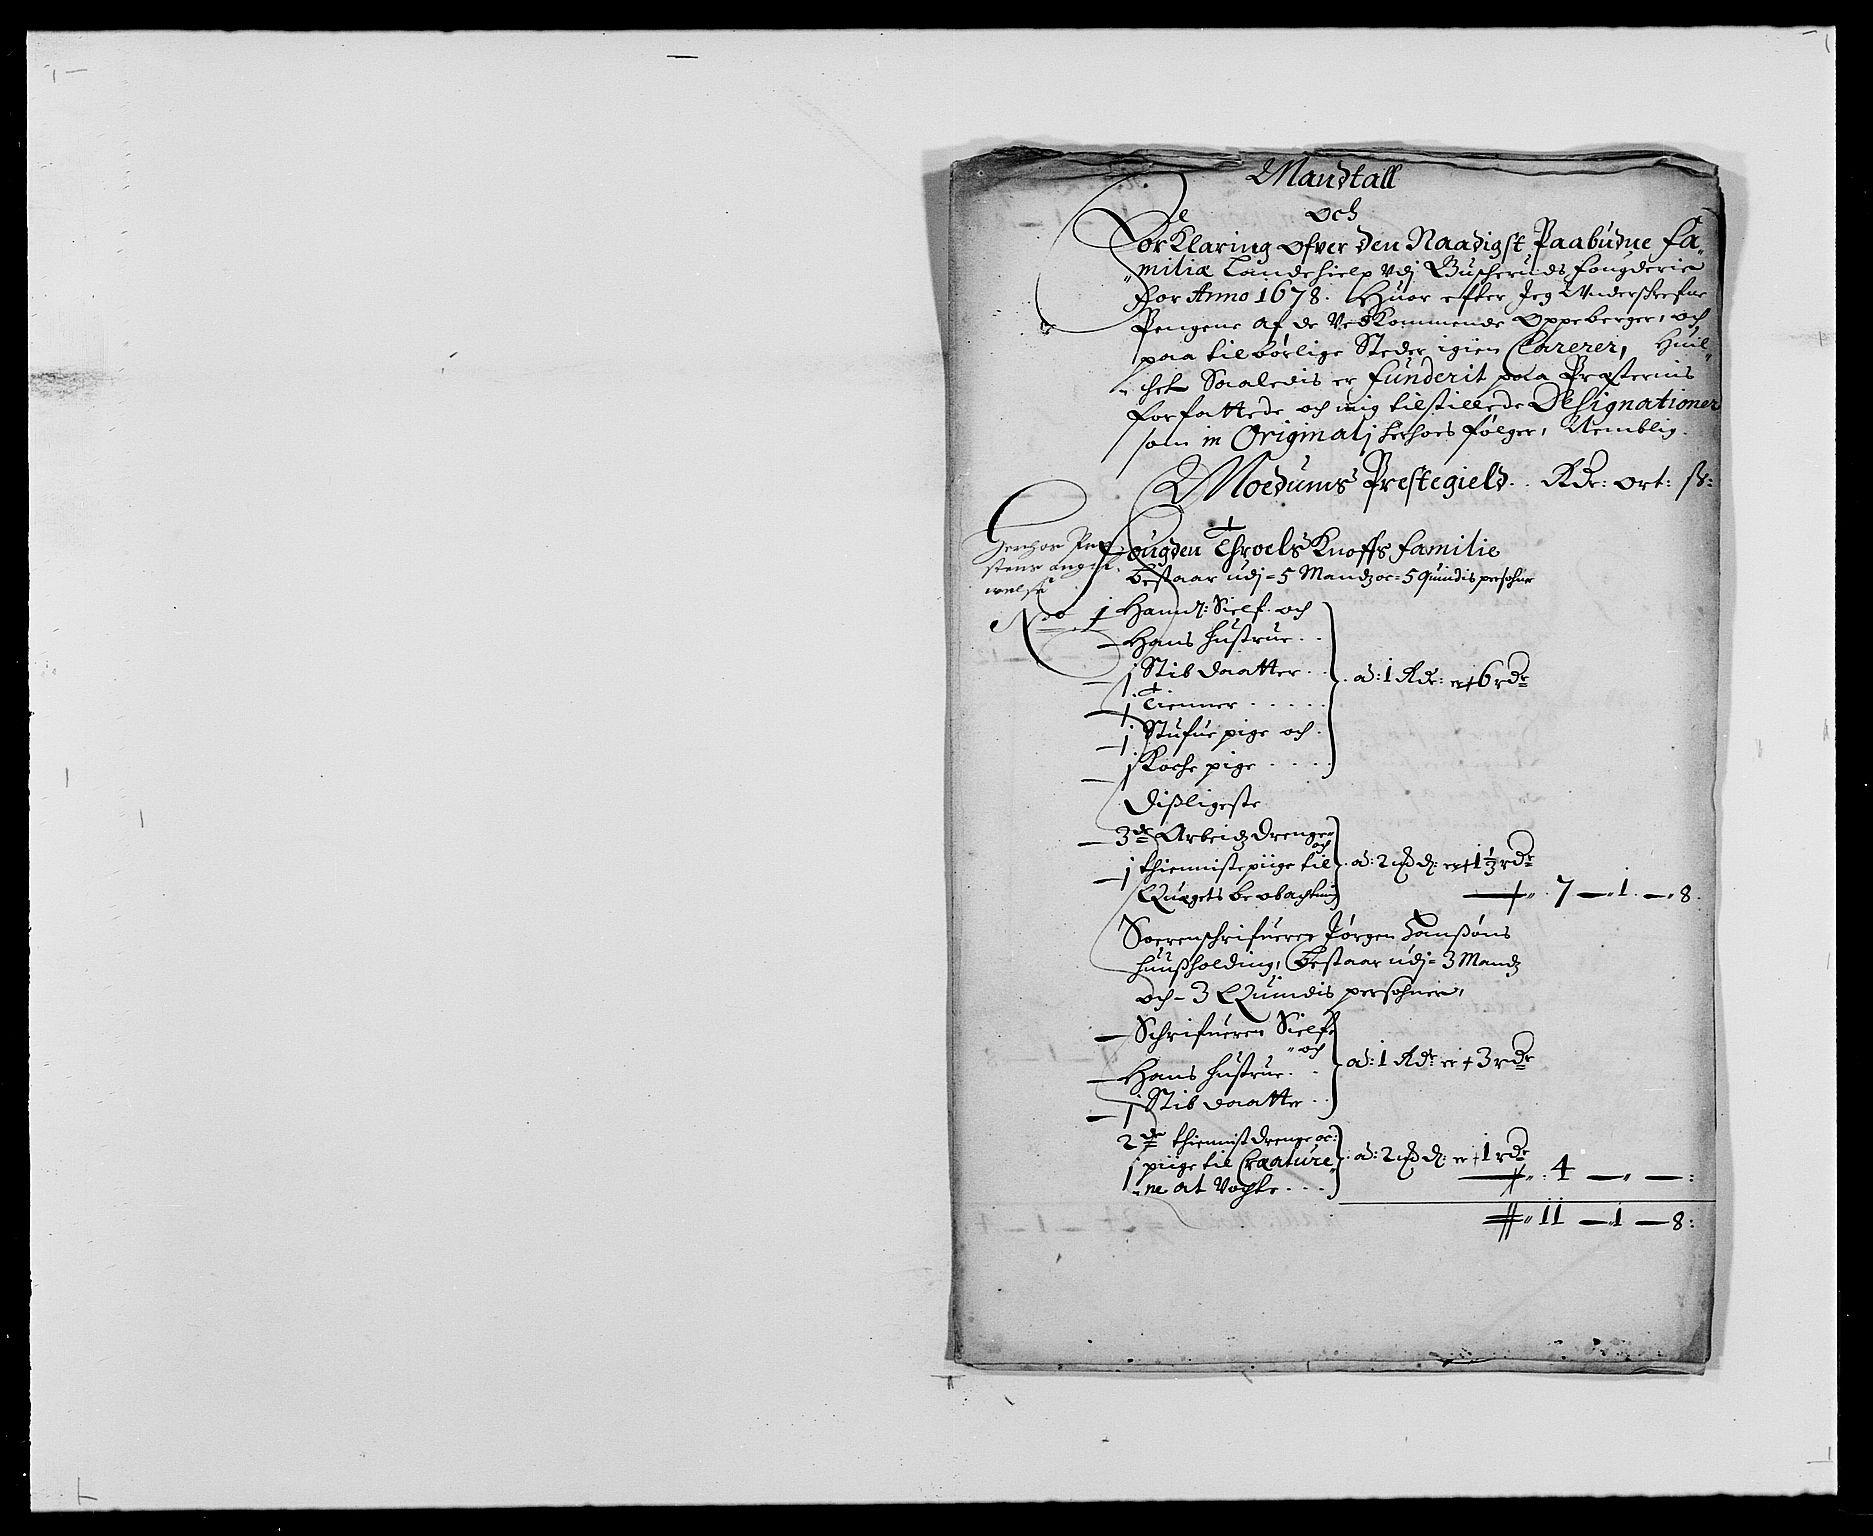 RA, Rentekammeret inntil 1814, Reviderte regnskaper, Fogderegnskap, R25/L1674: Fogderegnskap Buskerud, 1678-1681, s. 148